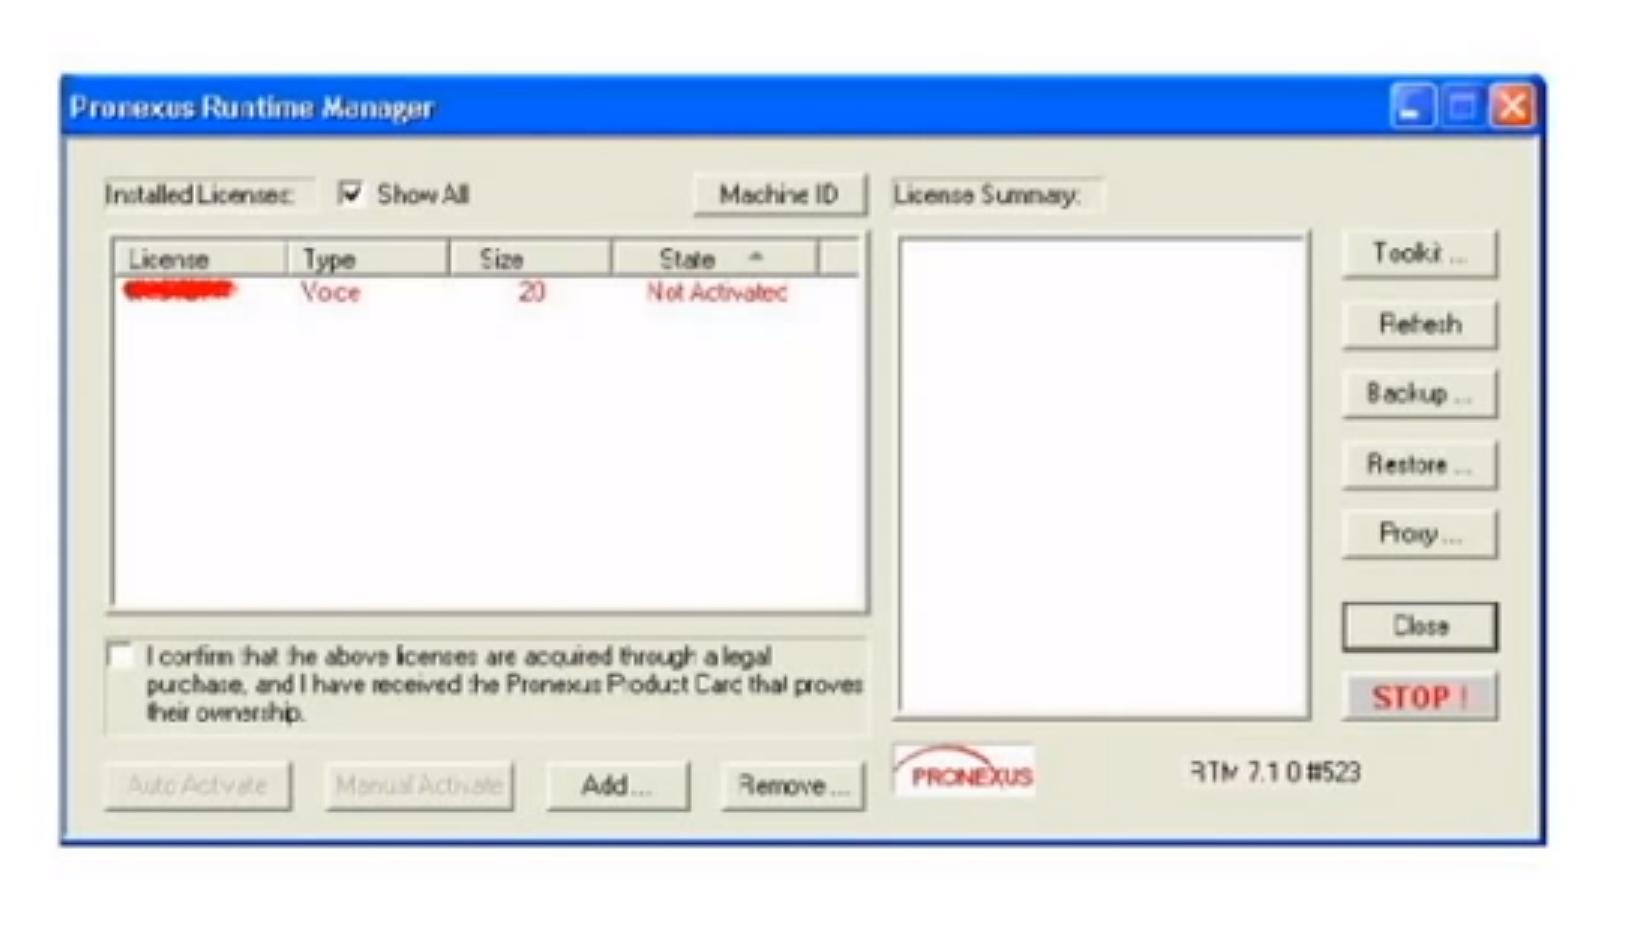 Pronexus VBVoice activating license screenshot